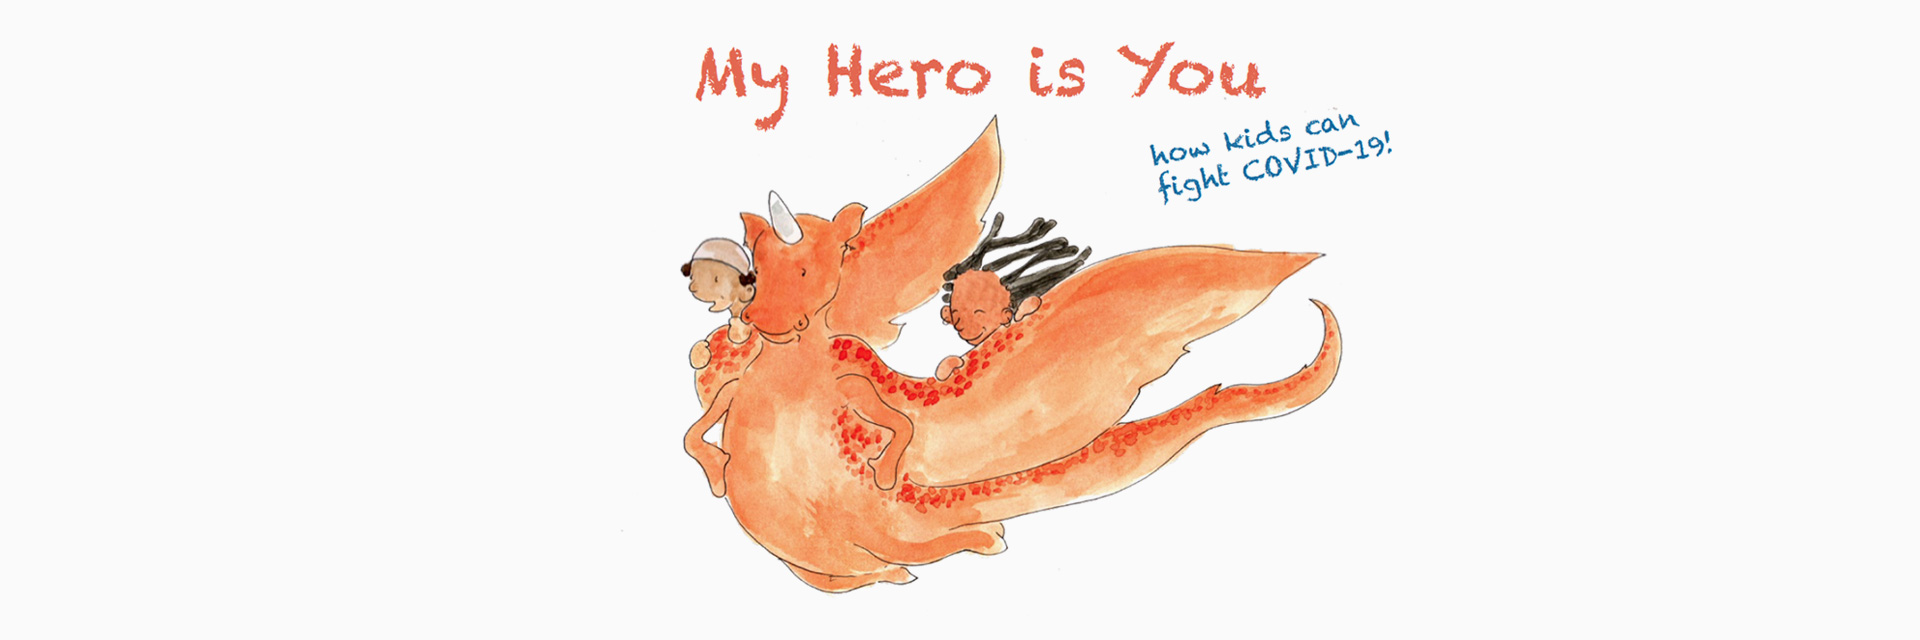 My Hero is You 你是我心中的英雄